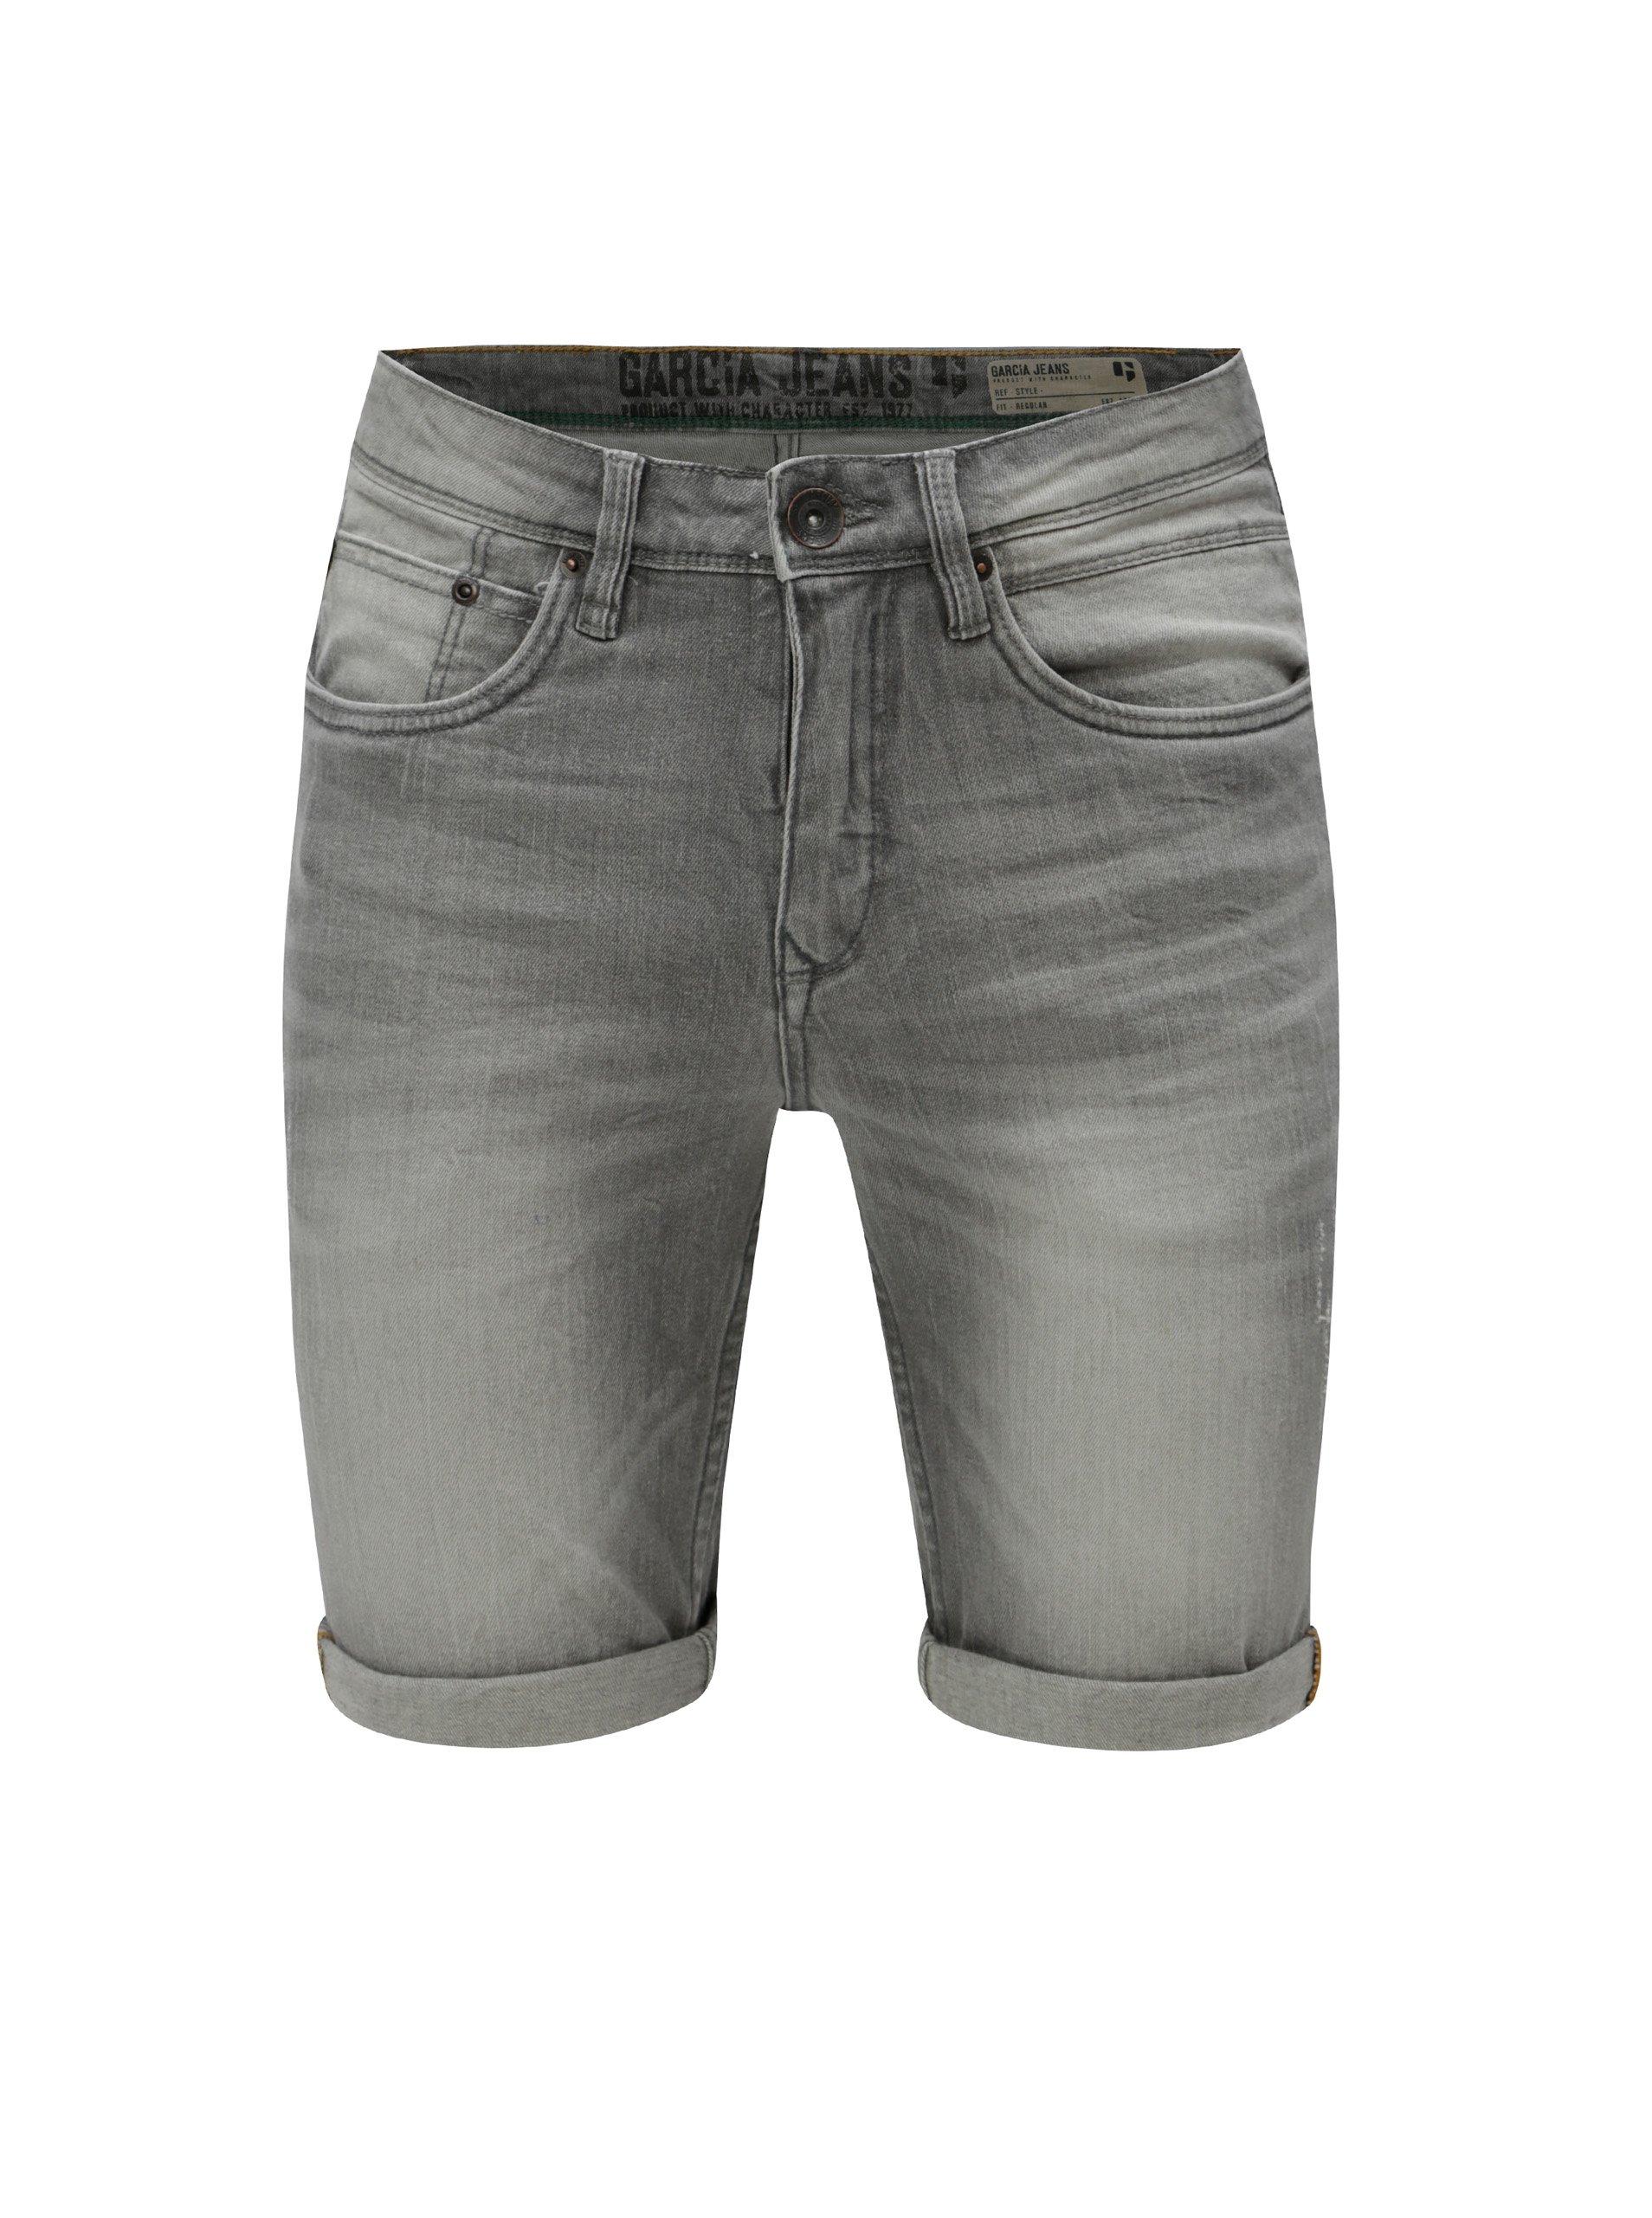 Šedé pánské džínové kraťasy s vyšisovaným efektem Garcia Jeans Russo short 9824243f76